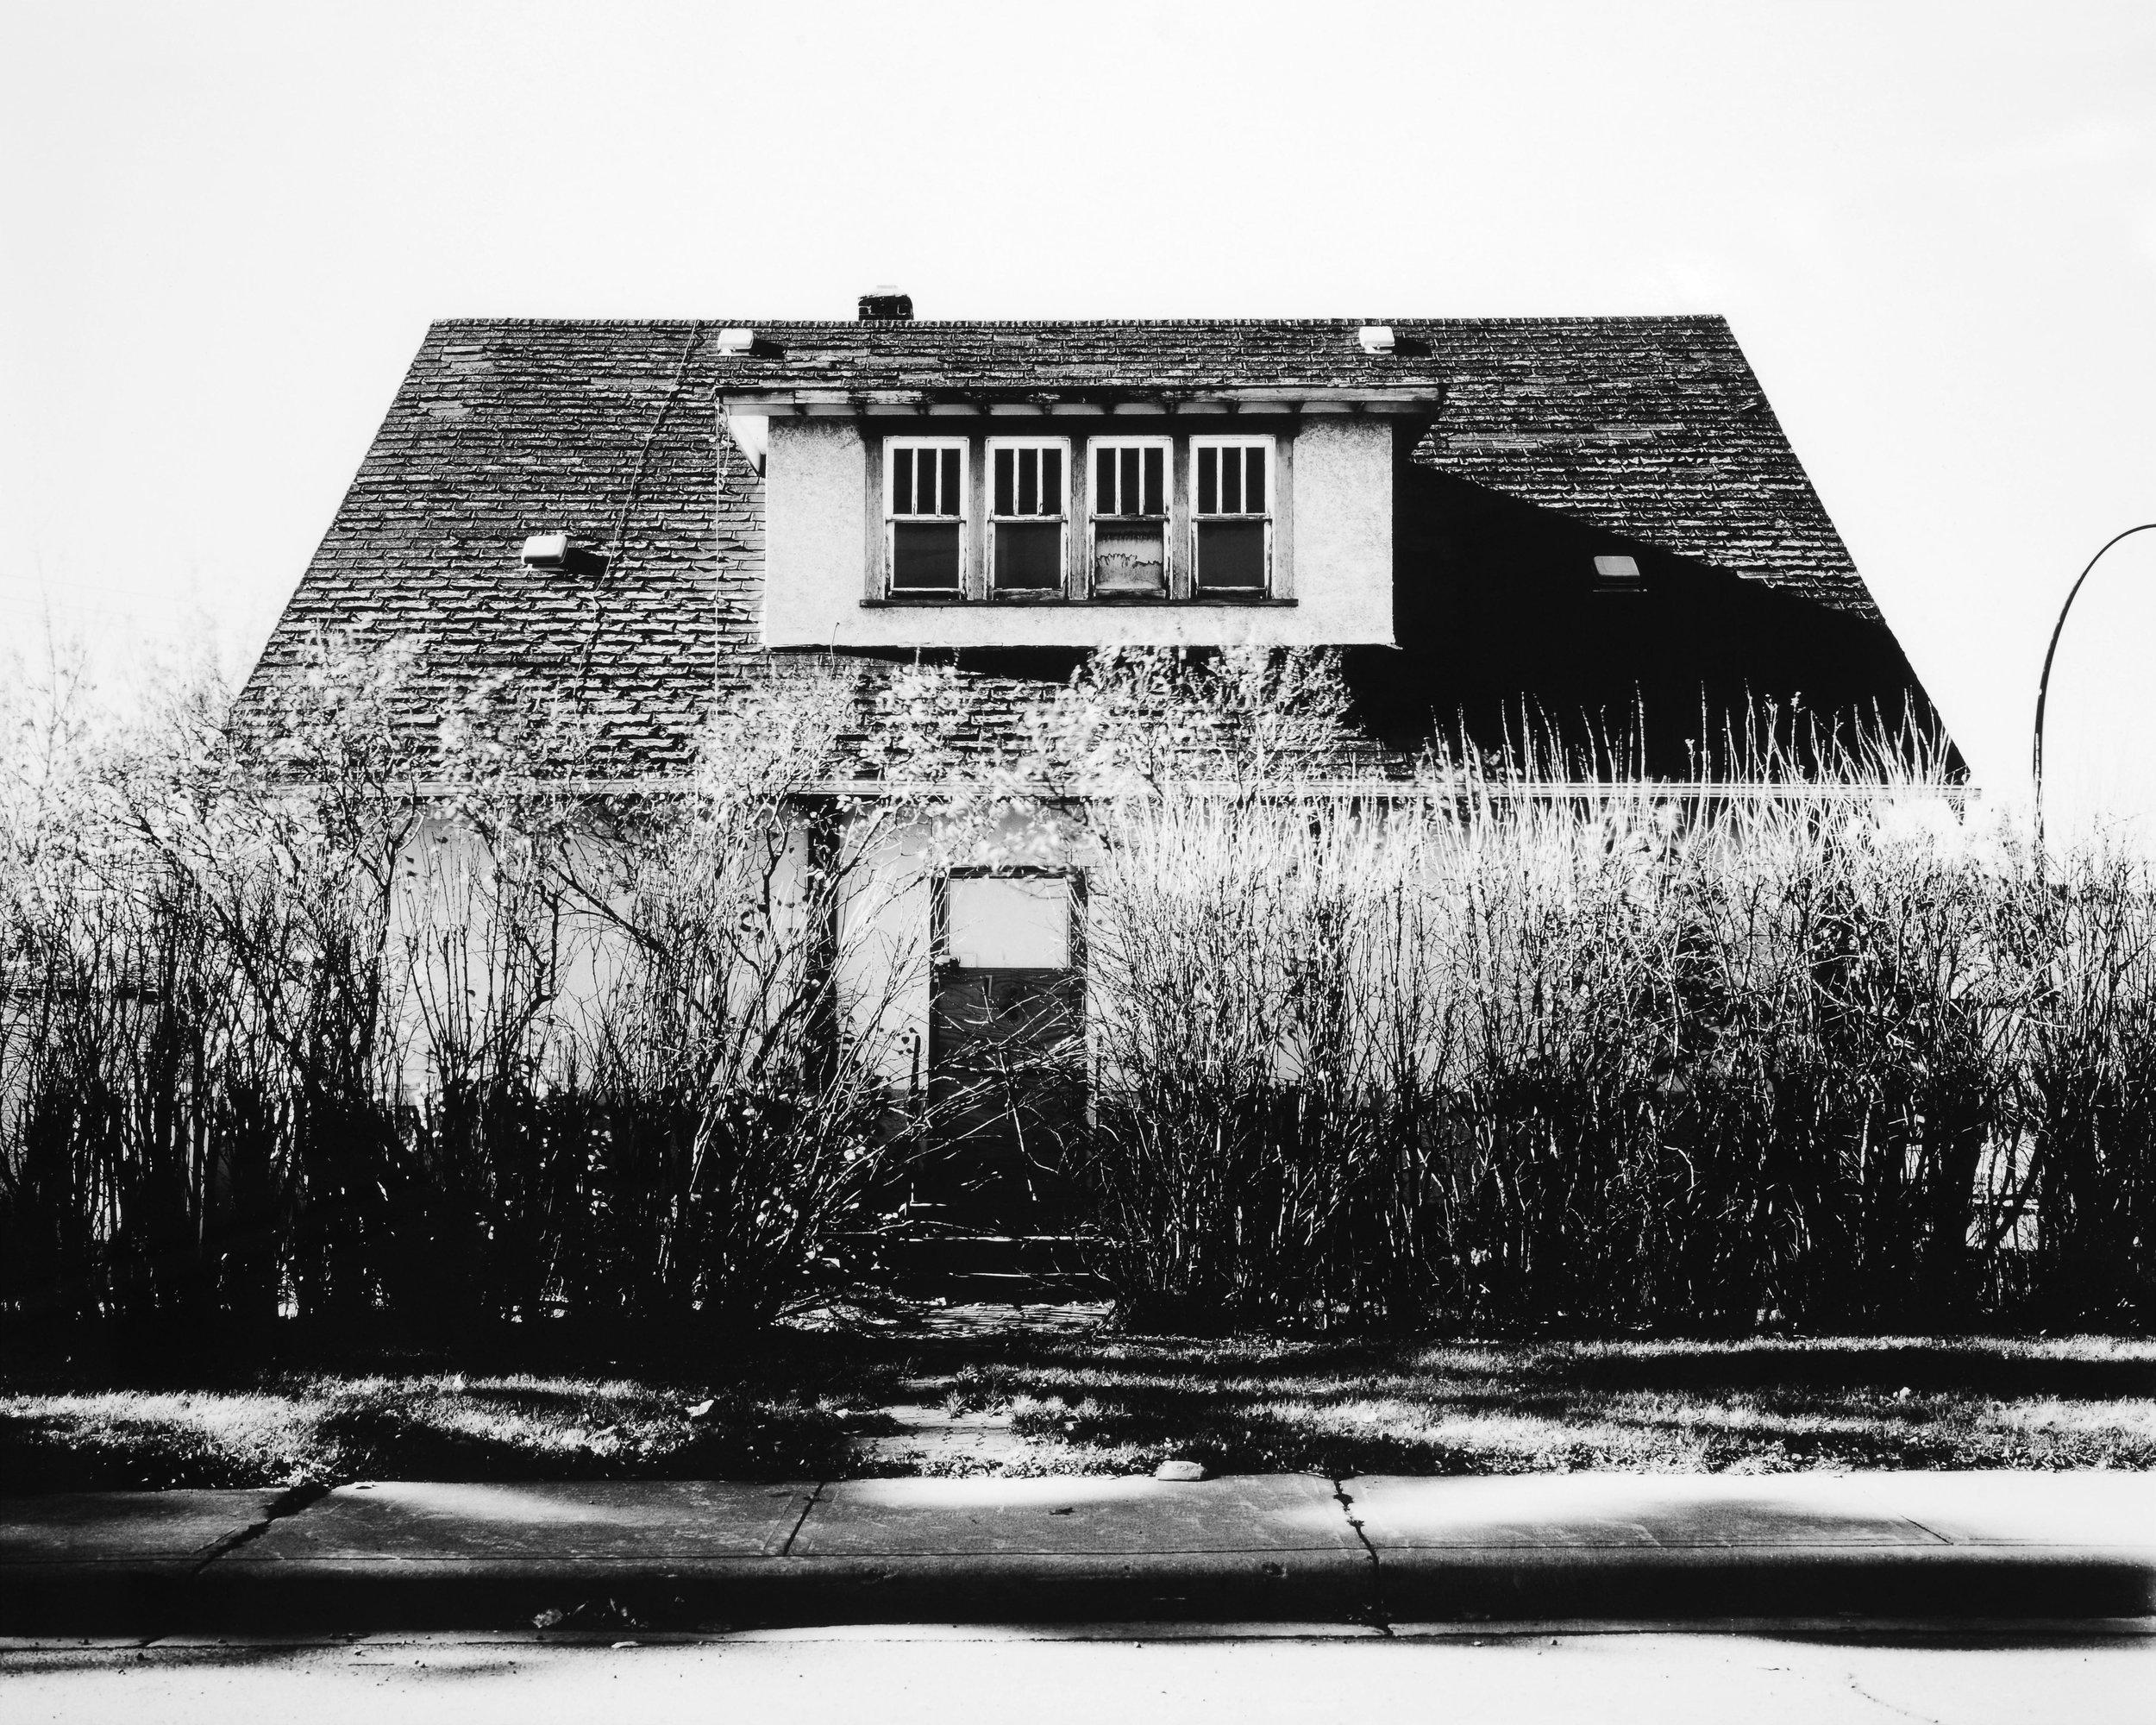 Reproduction - House One - Print - No Border.jpg